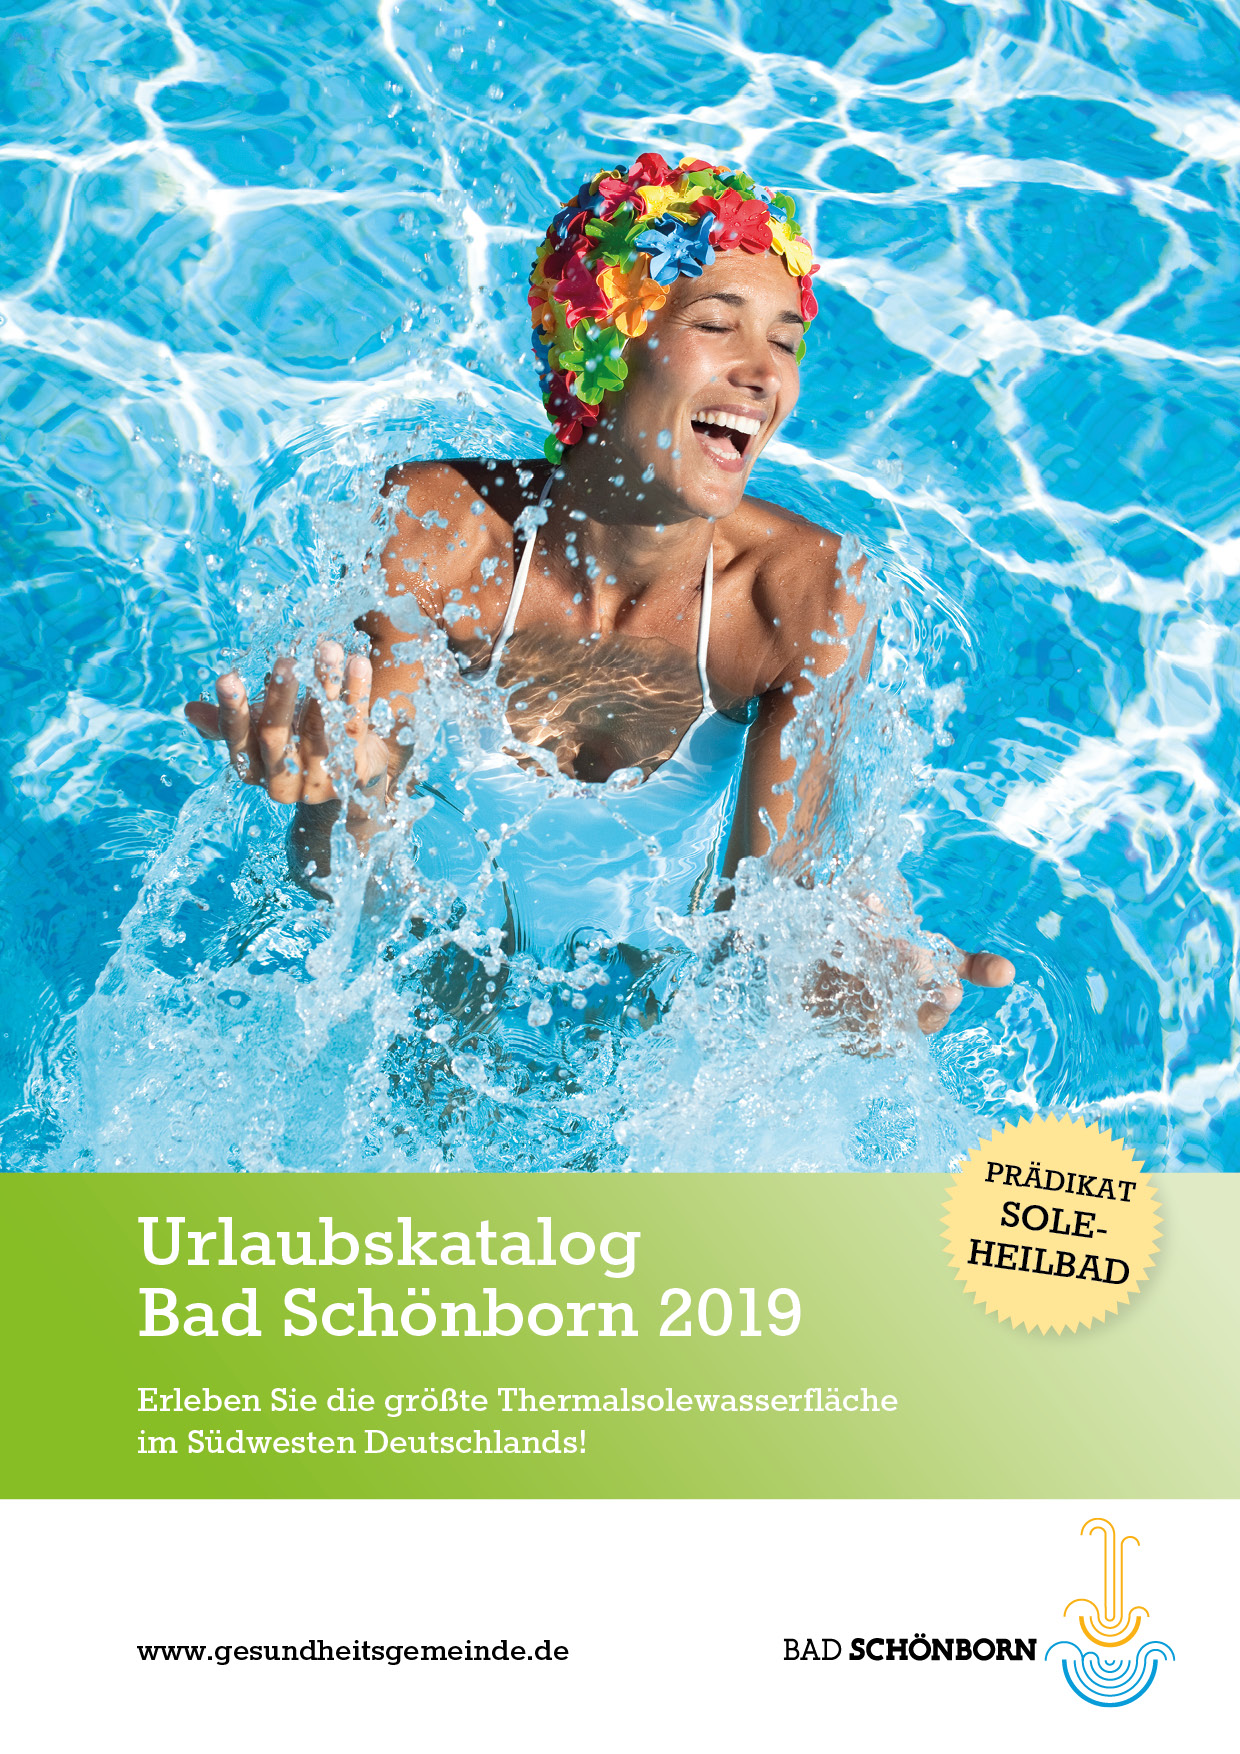 Titelseite Urlaubskatalog 2019